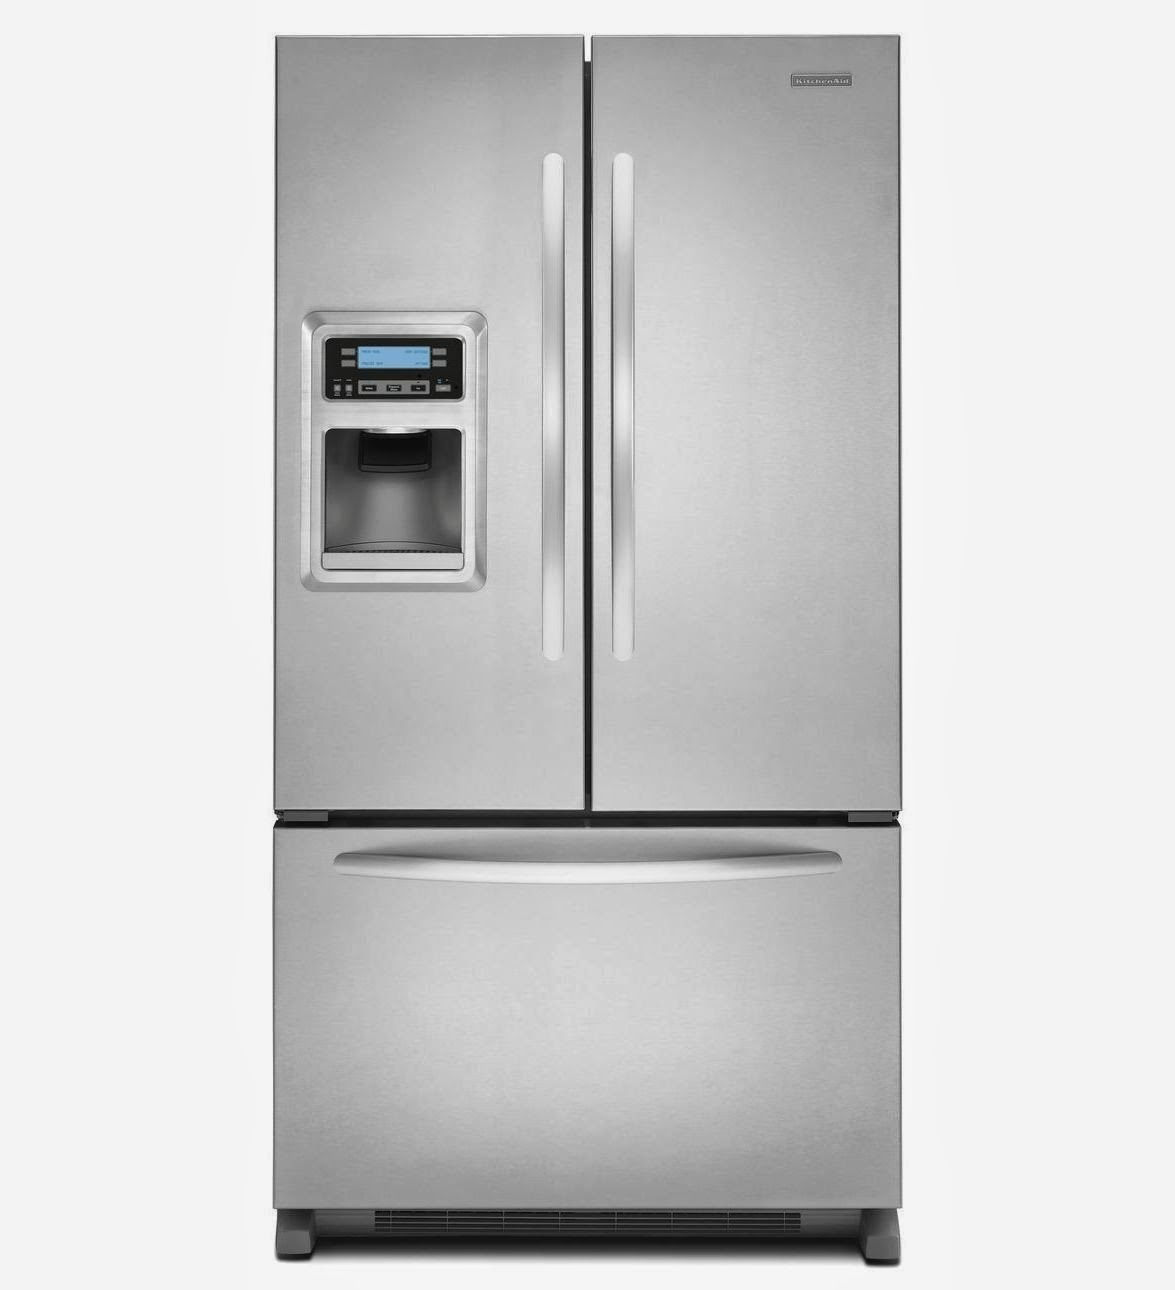 Kitchenaid Black Counter Depth Refrigerator: Counter Depth Refrigerators Reviews: Kitchenaid Counter